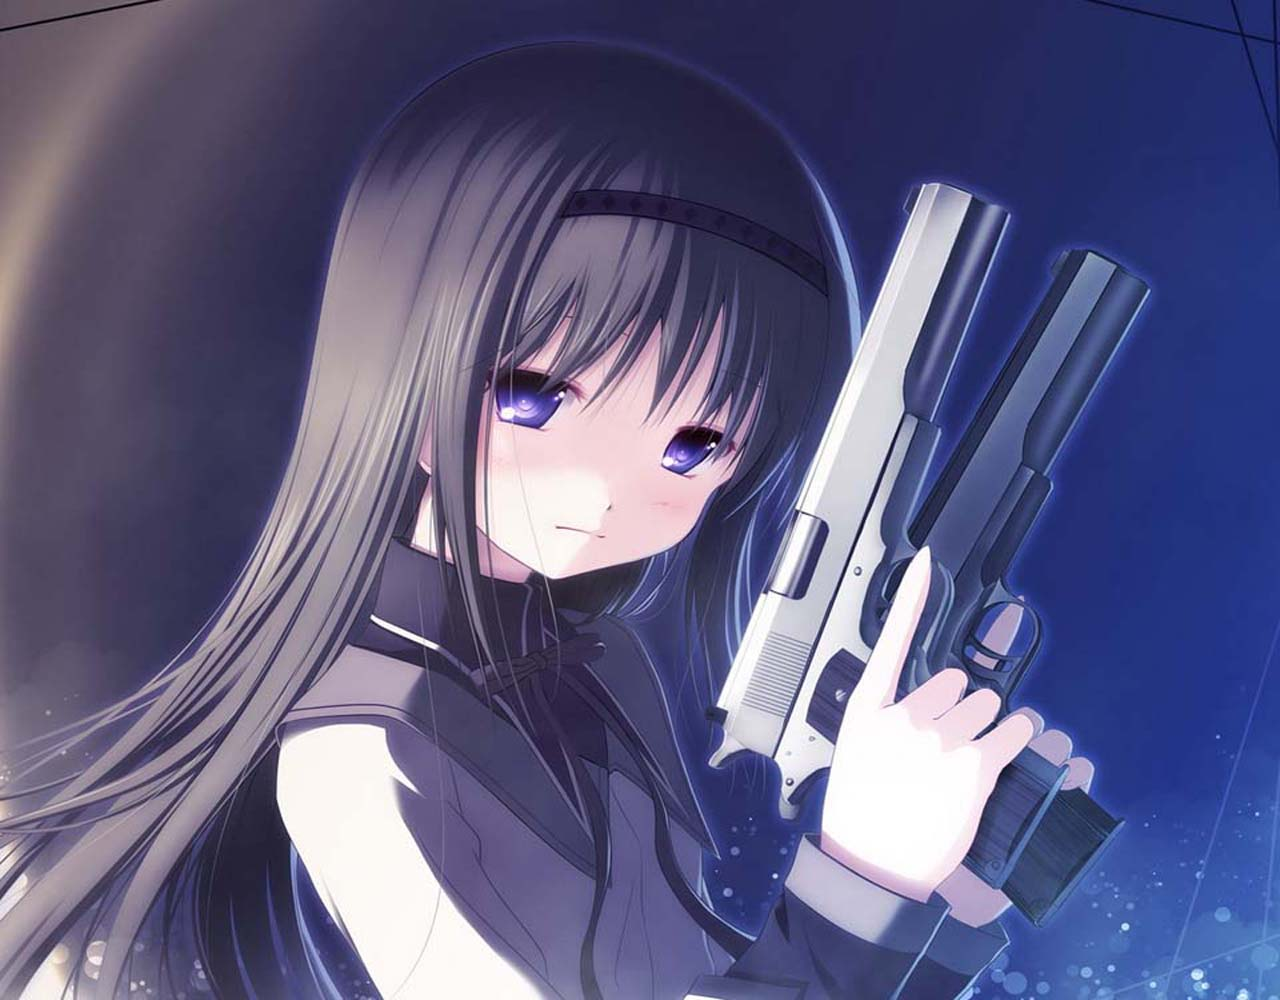 Gambar anime 3 - Hacanimedream